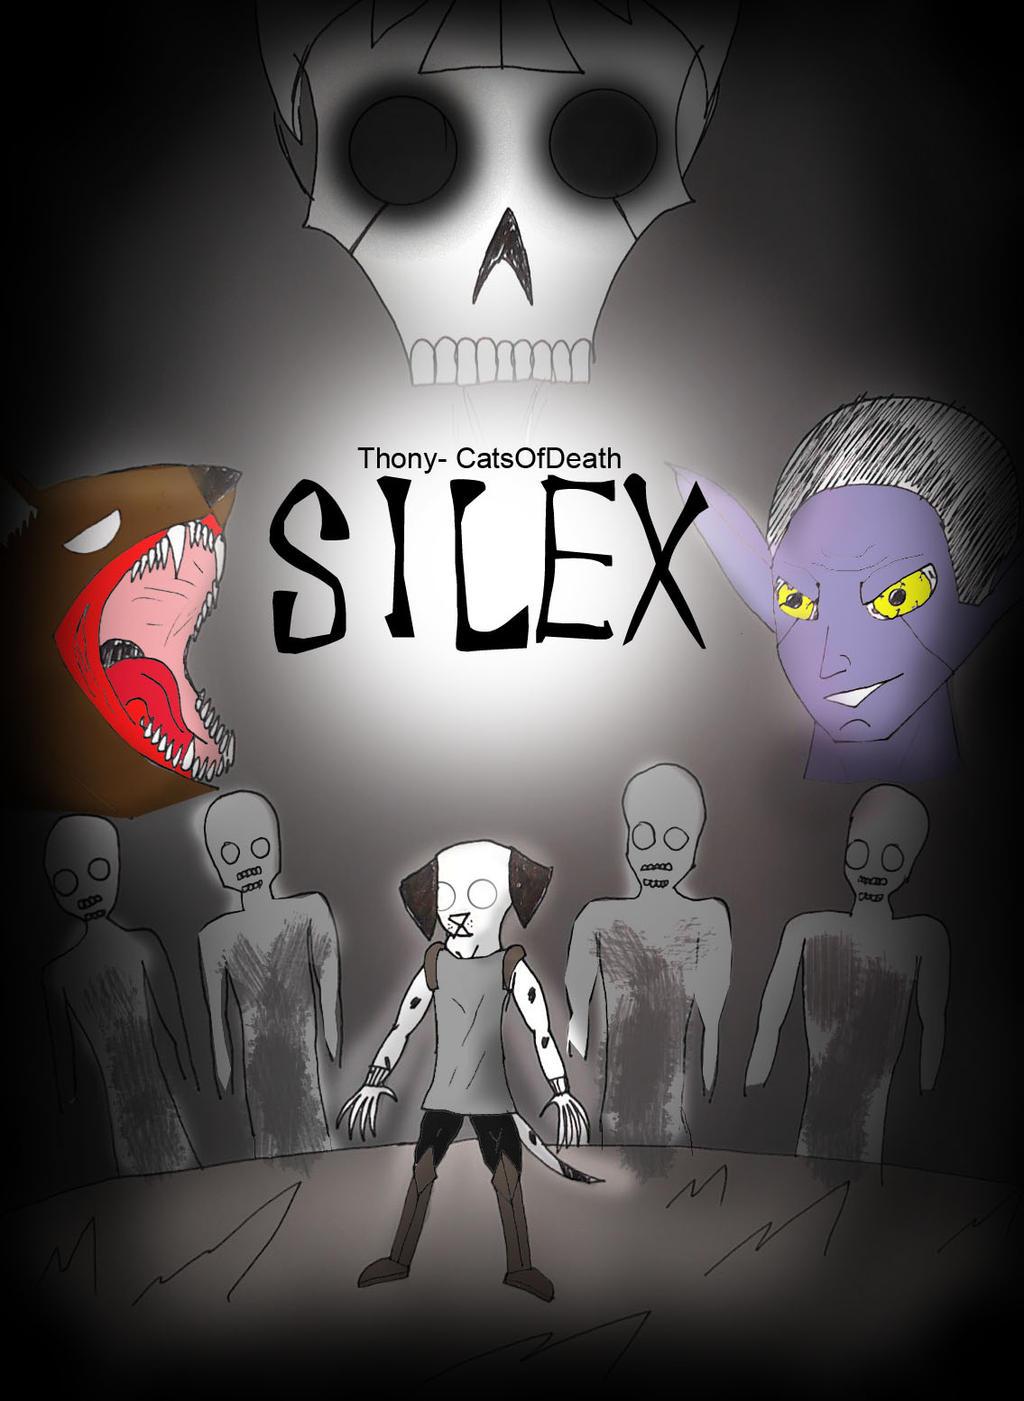 SILEX by Catsofdeath